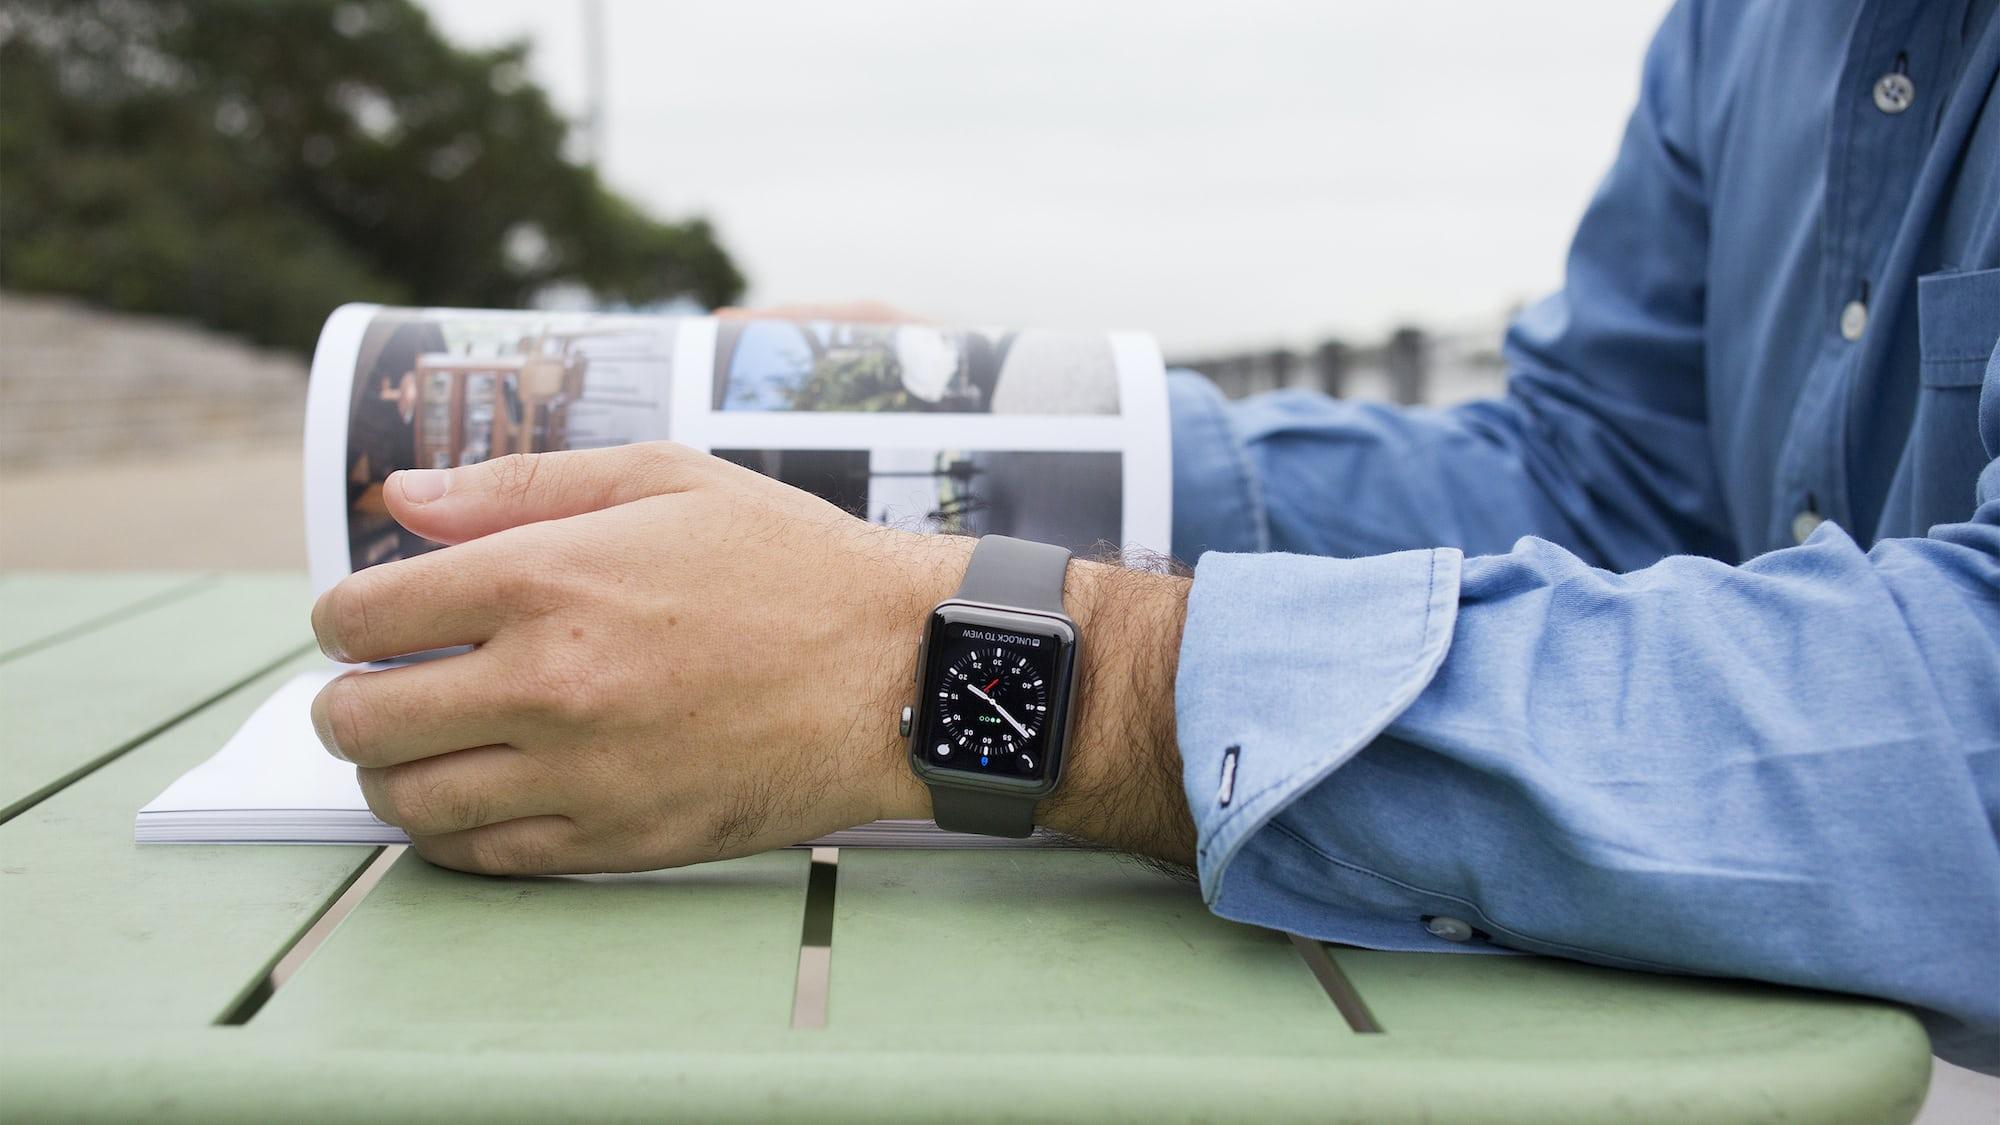 3h0a5187 copy.jpg?ixlib=rails 1.1 A Week On The Wrist: The Apple Watch Series 3 Edition A Week On The Wrist: The Apple Watch Series 3 Edition 3H0A5187 copy